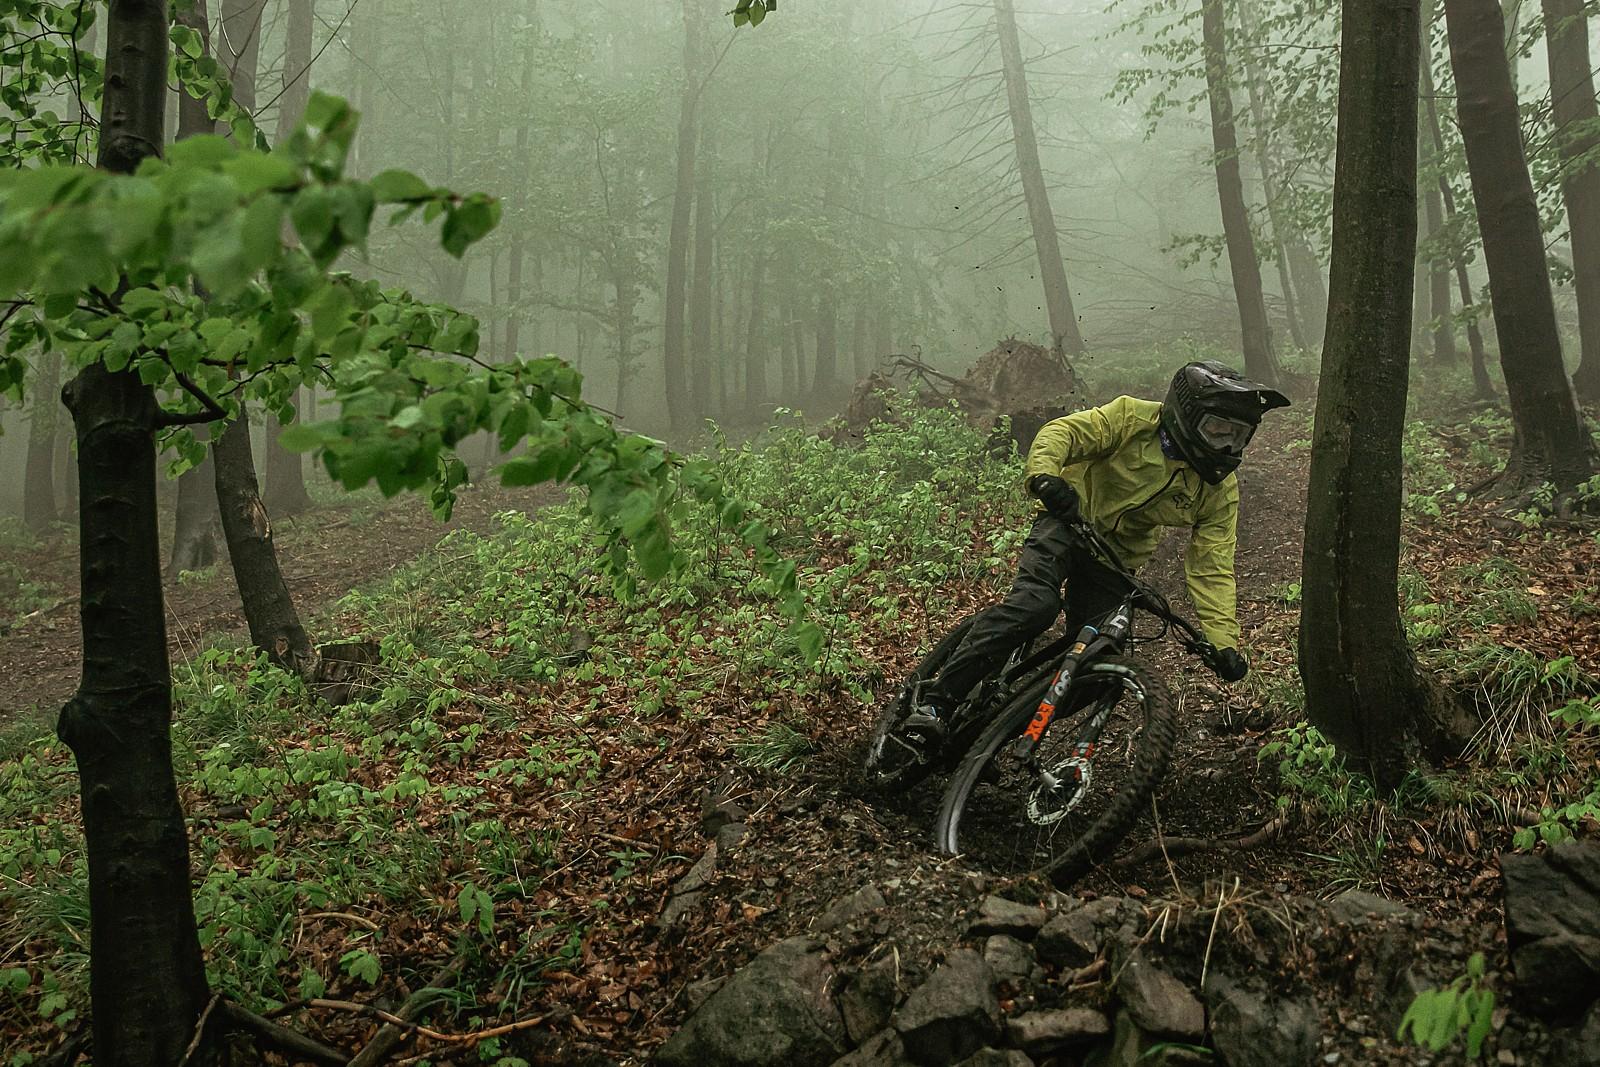 fog - Banan - Mountain Biking Pictures - Vital MTB